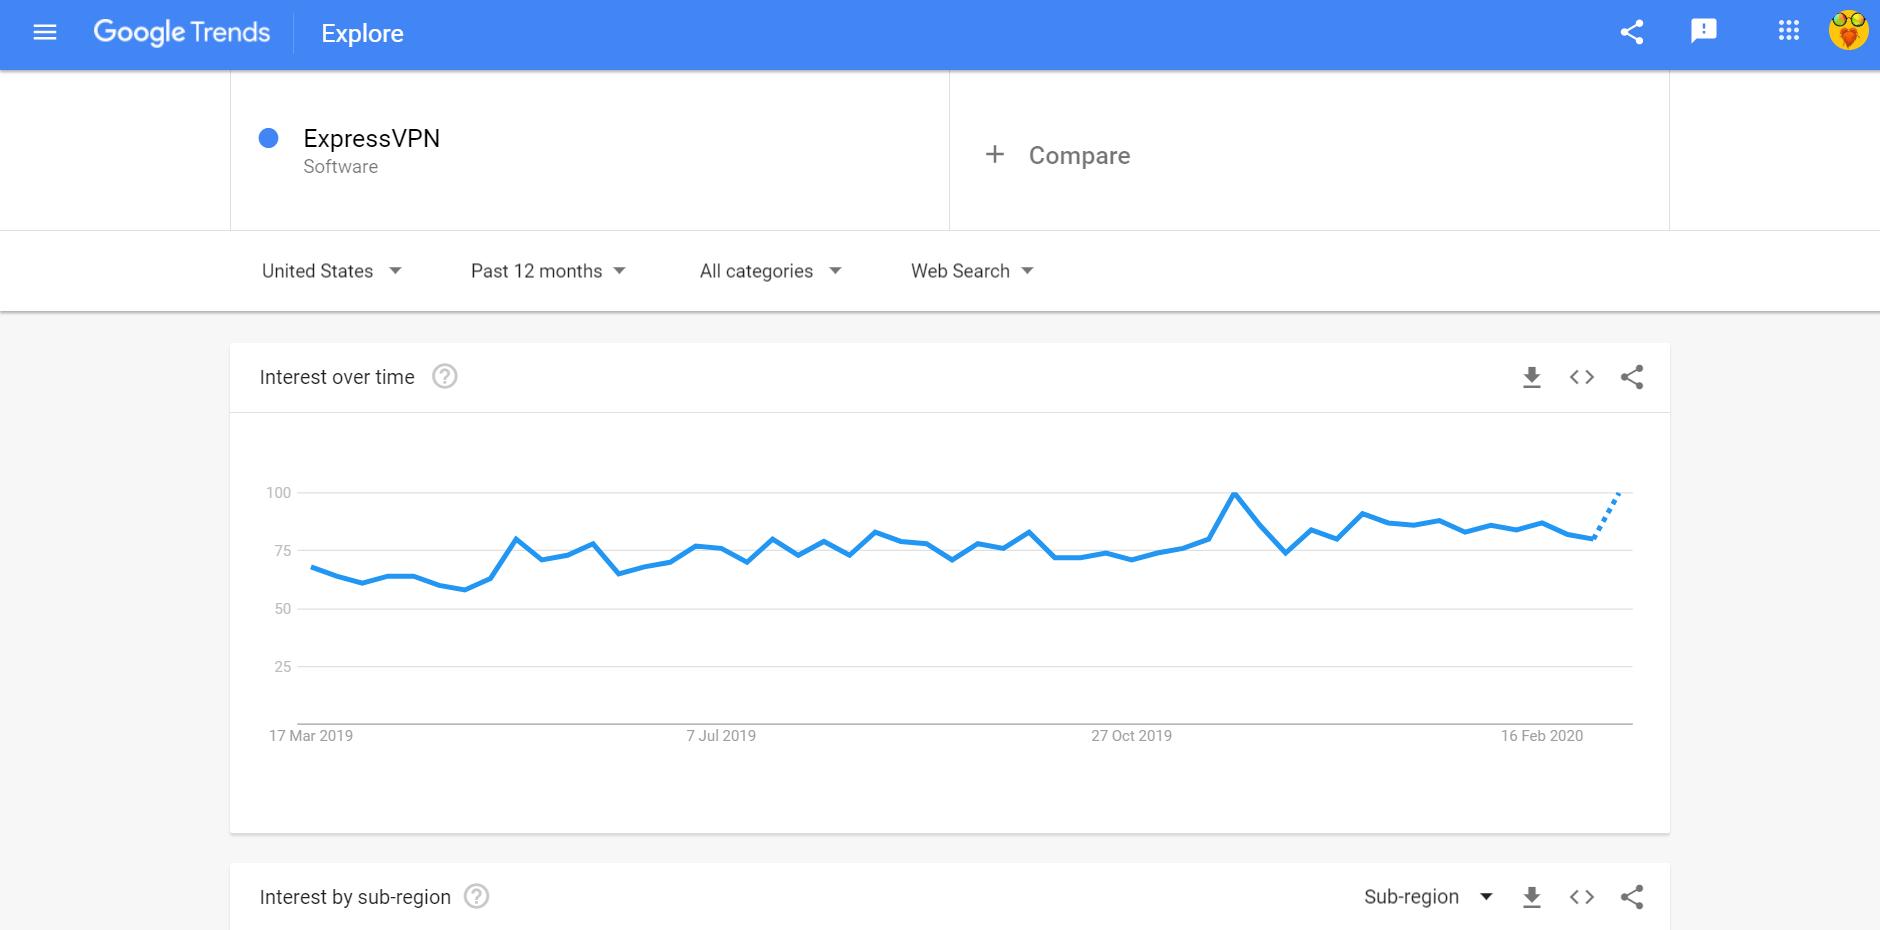 google trends ExpressVPN